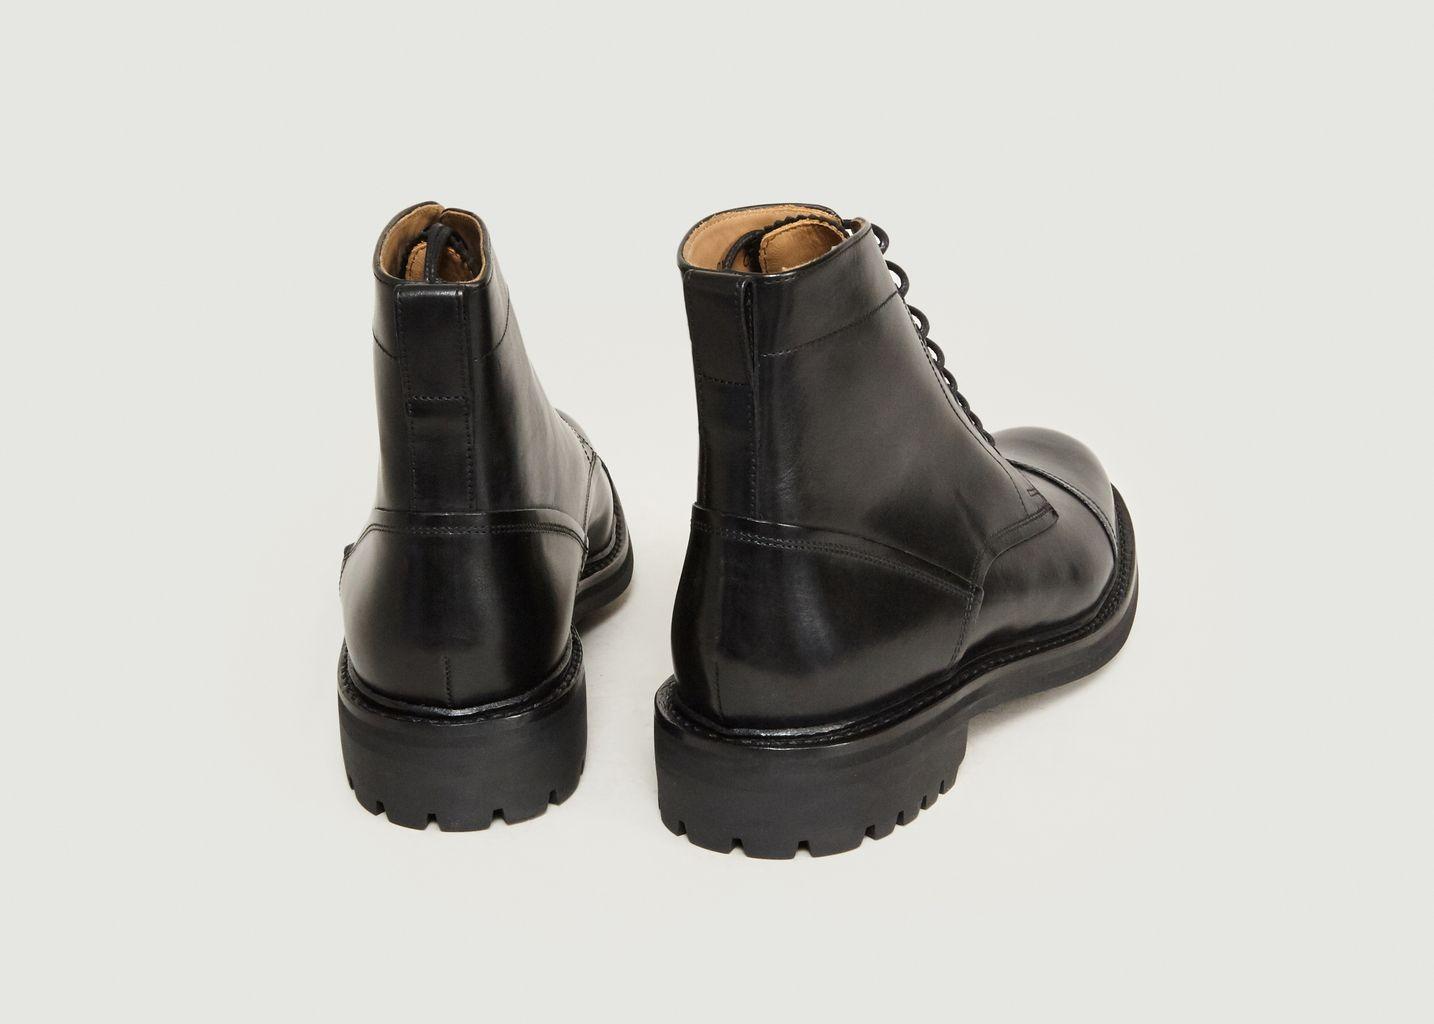 Chaussures Joseph - Grenson